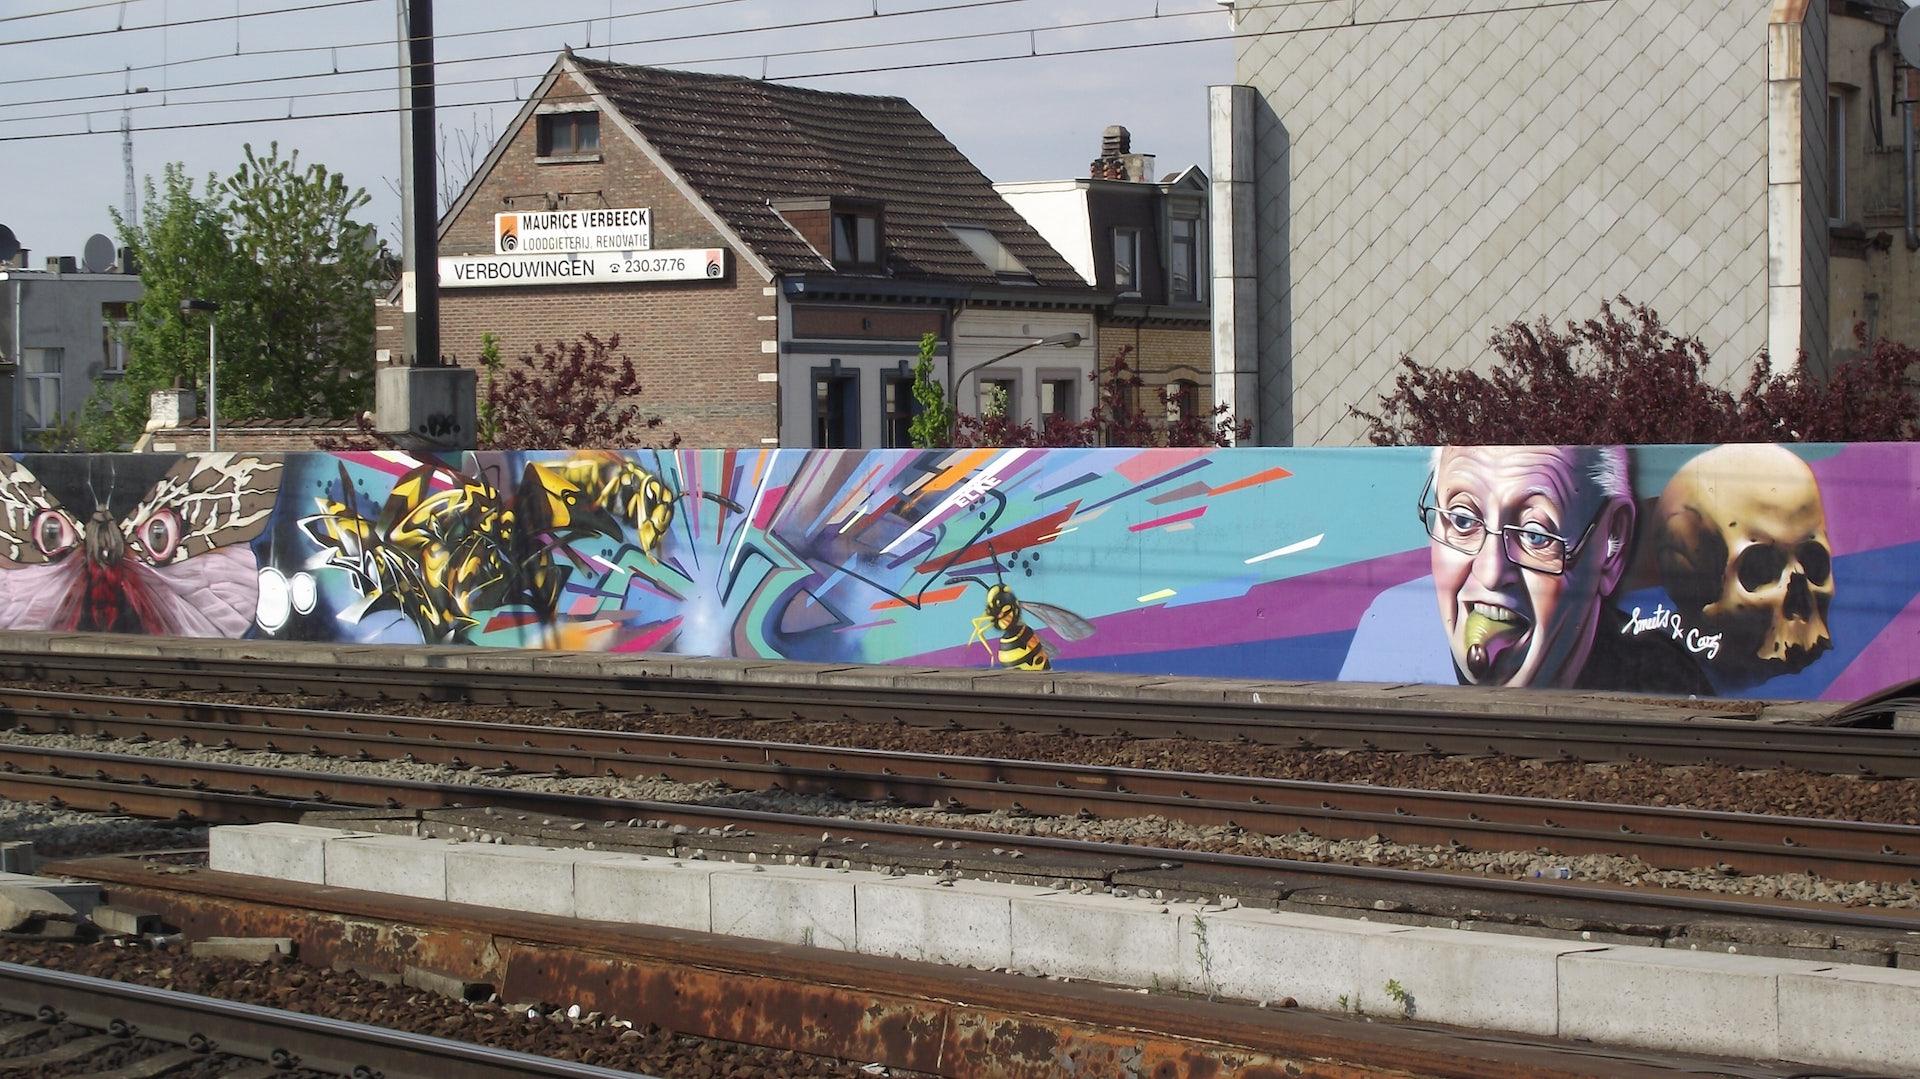 street art Berchem station